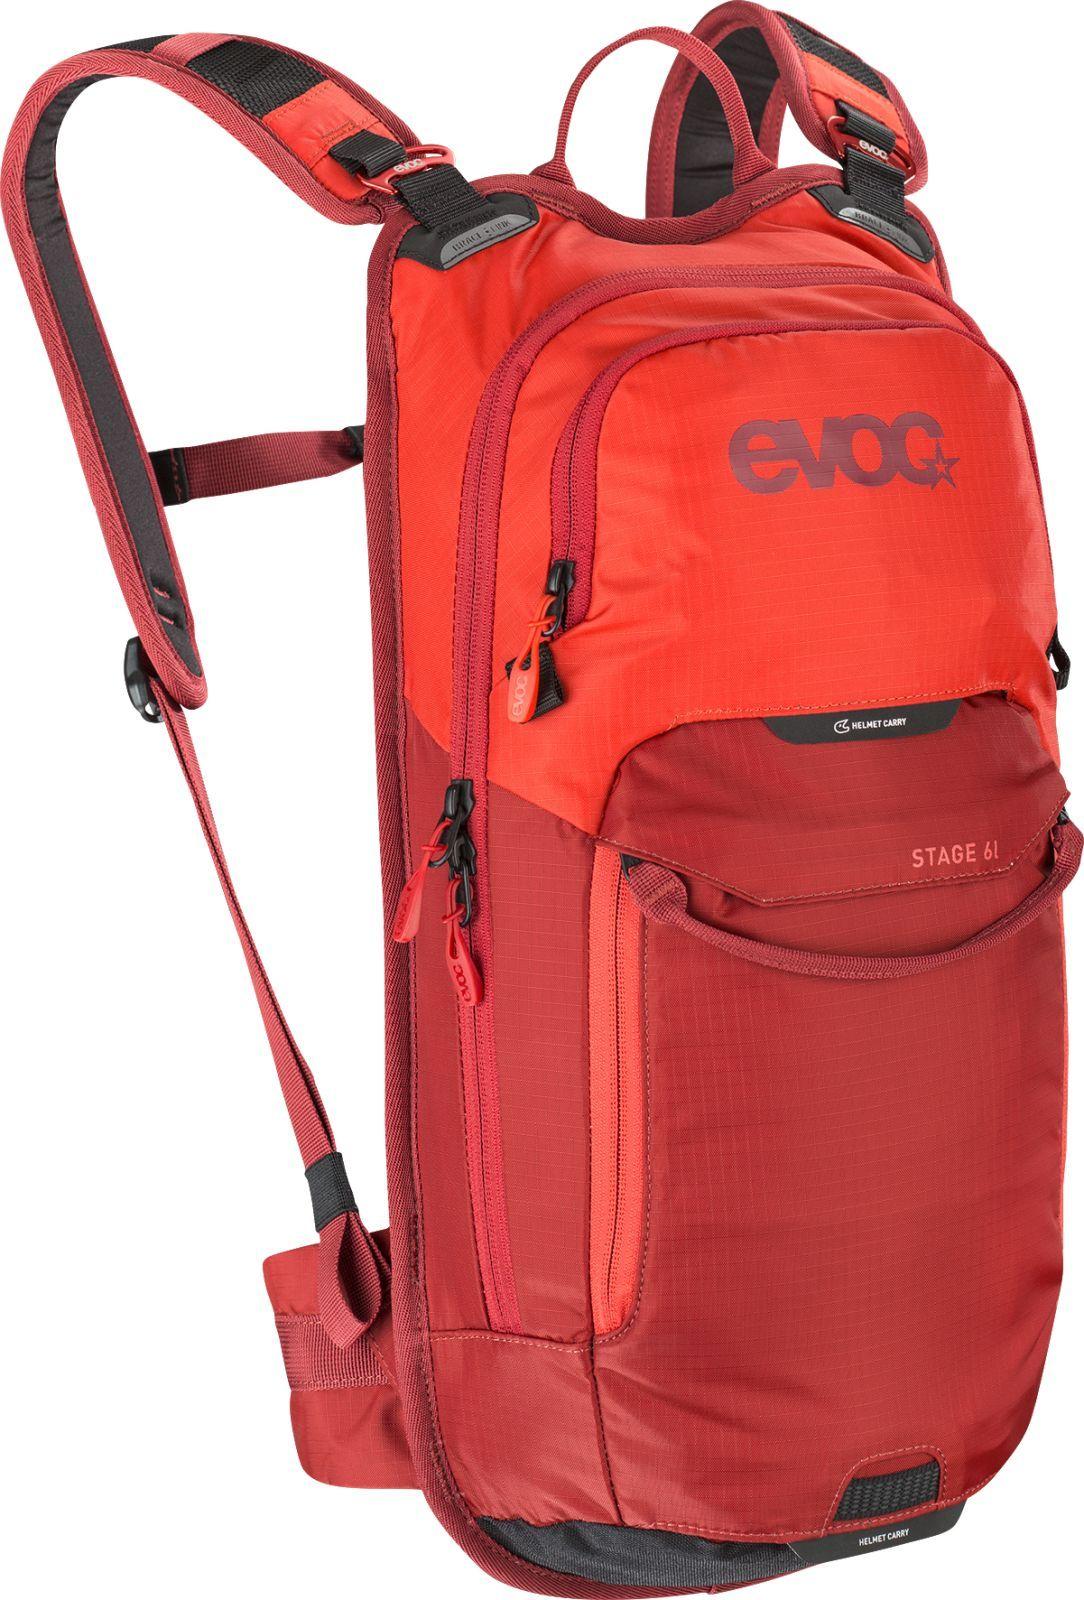 Evoc Stage 6L + 2L Bladder - orange/chili red uni